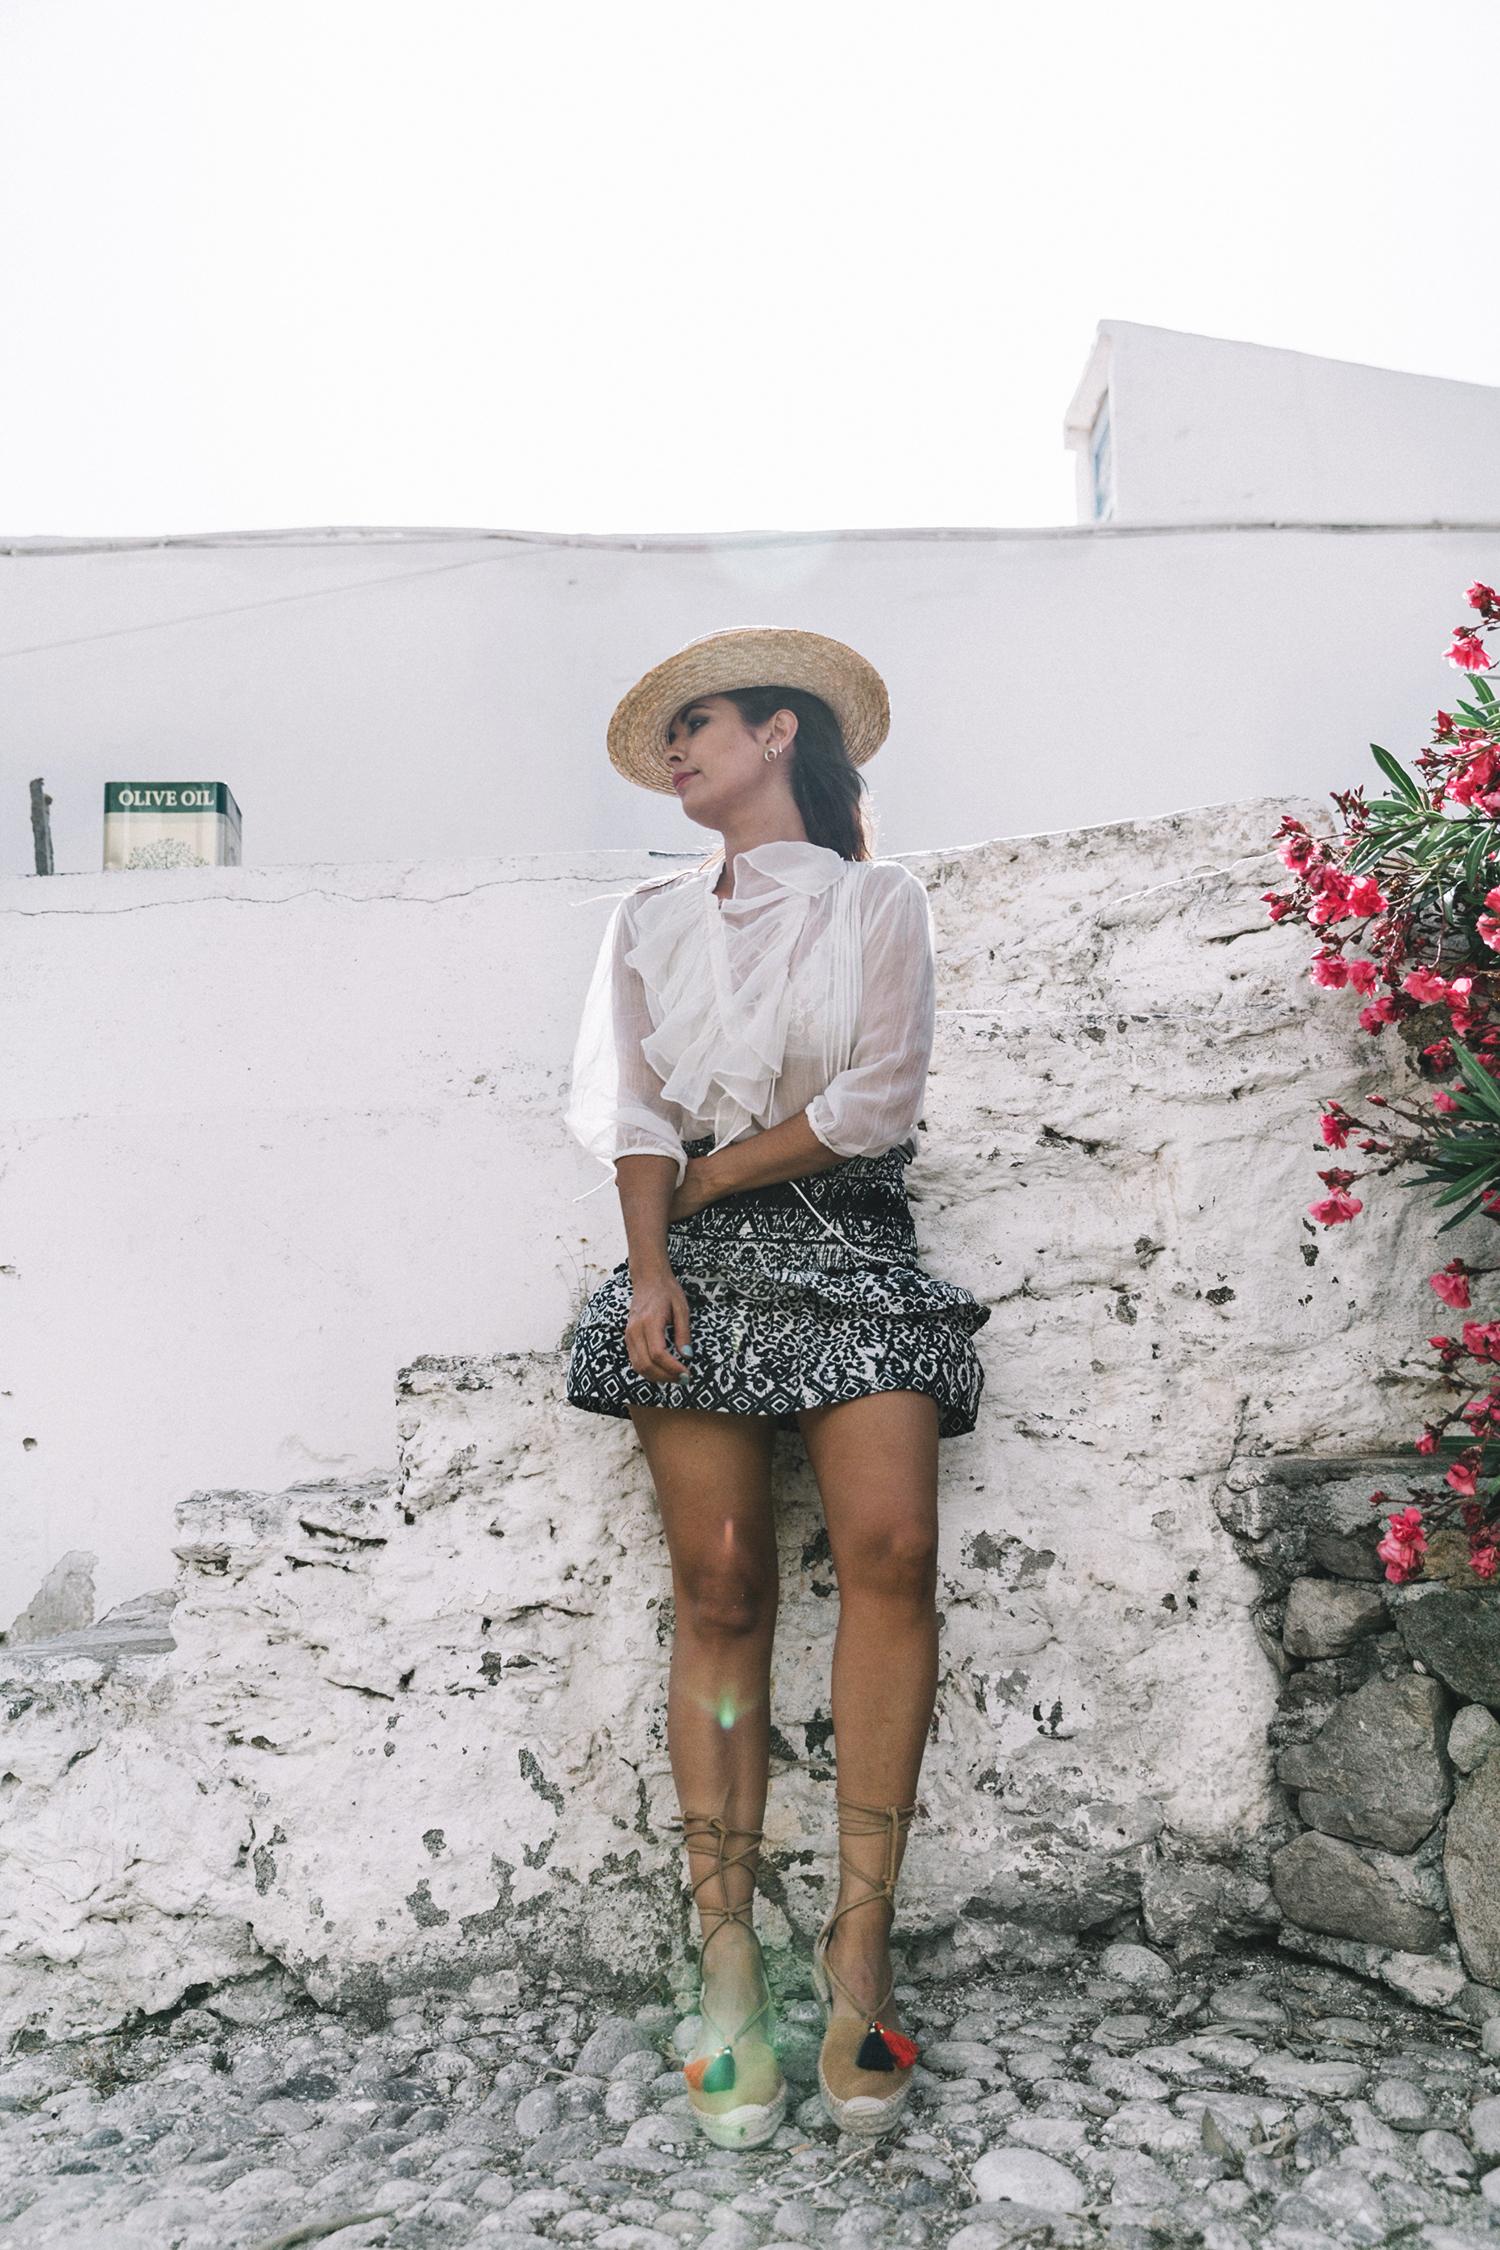 Lace_up_Blouse-Ralph_Lauren-Soludos_Espadrilles-Soludos_Escapes-Skirt-Straw_Hat-Canotier-Lack_Of_Color-Street_Style-Mykonos-Greece-Collage_Vintage-40